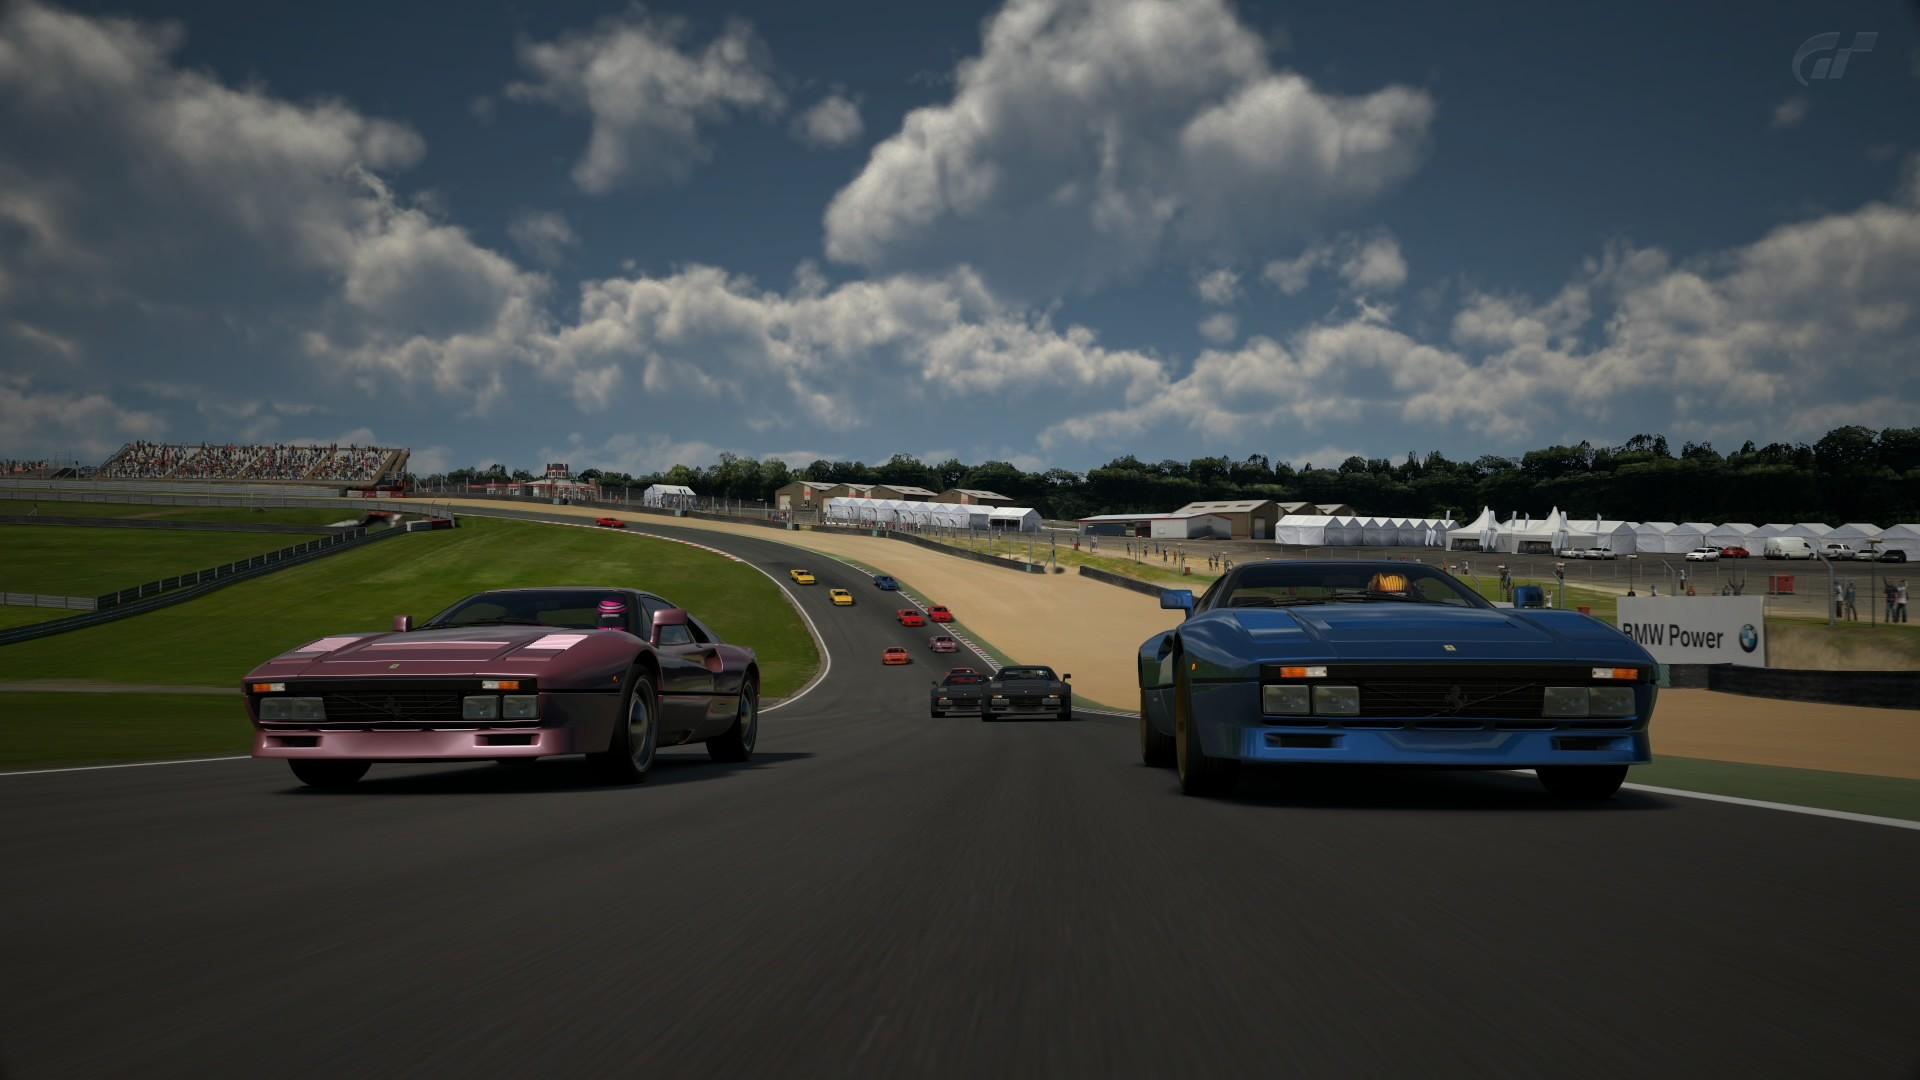 Crónica del Ferrari GTO en Brands Hatch Brands26